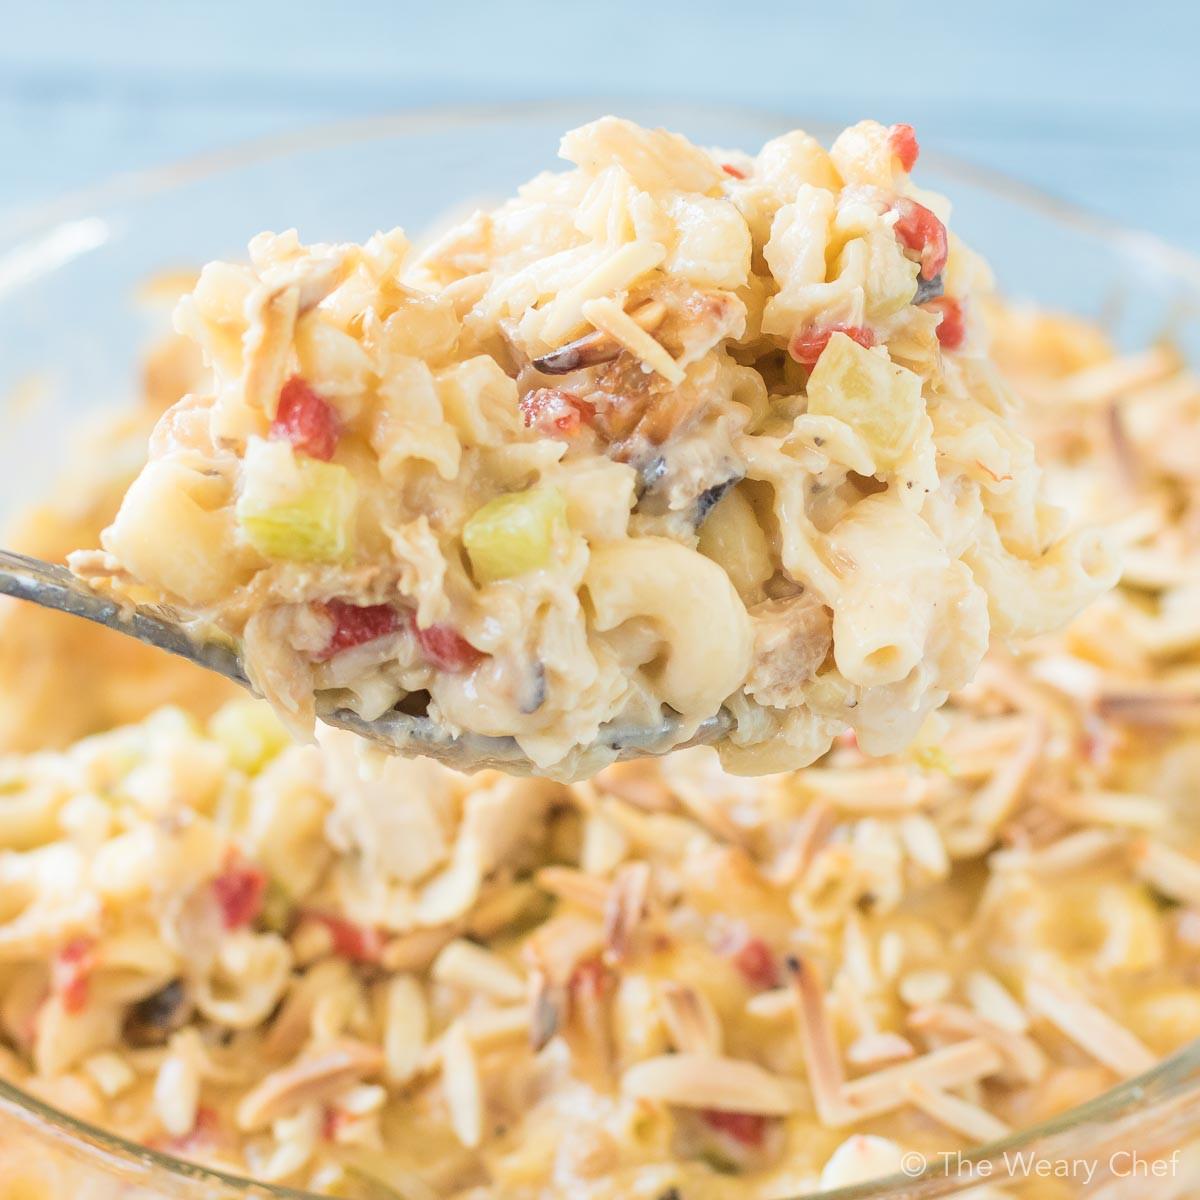 Tuna Noodle Casserole Recipes  Best Tuna Noodle Casserole The Weary Chef